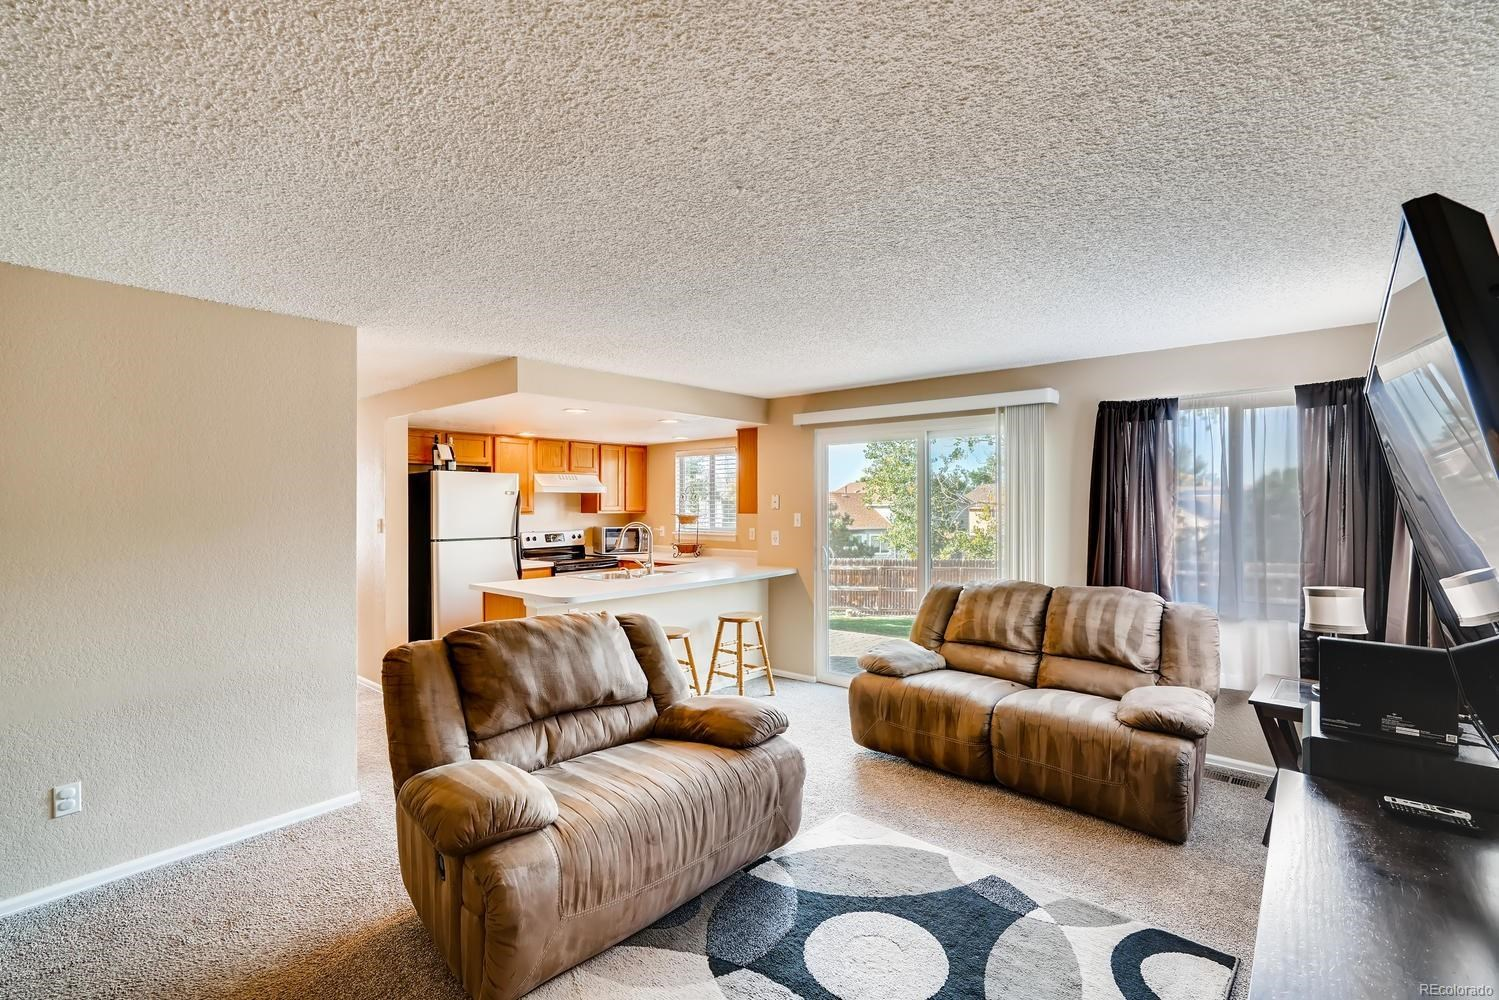 MLS# 8175396 - 1 - 5481  E 121st Place, Thornton, CO 80241